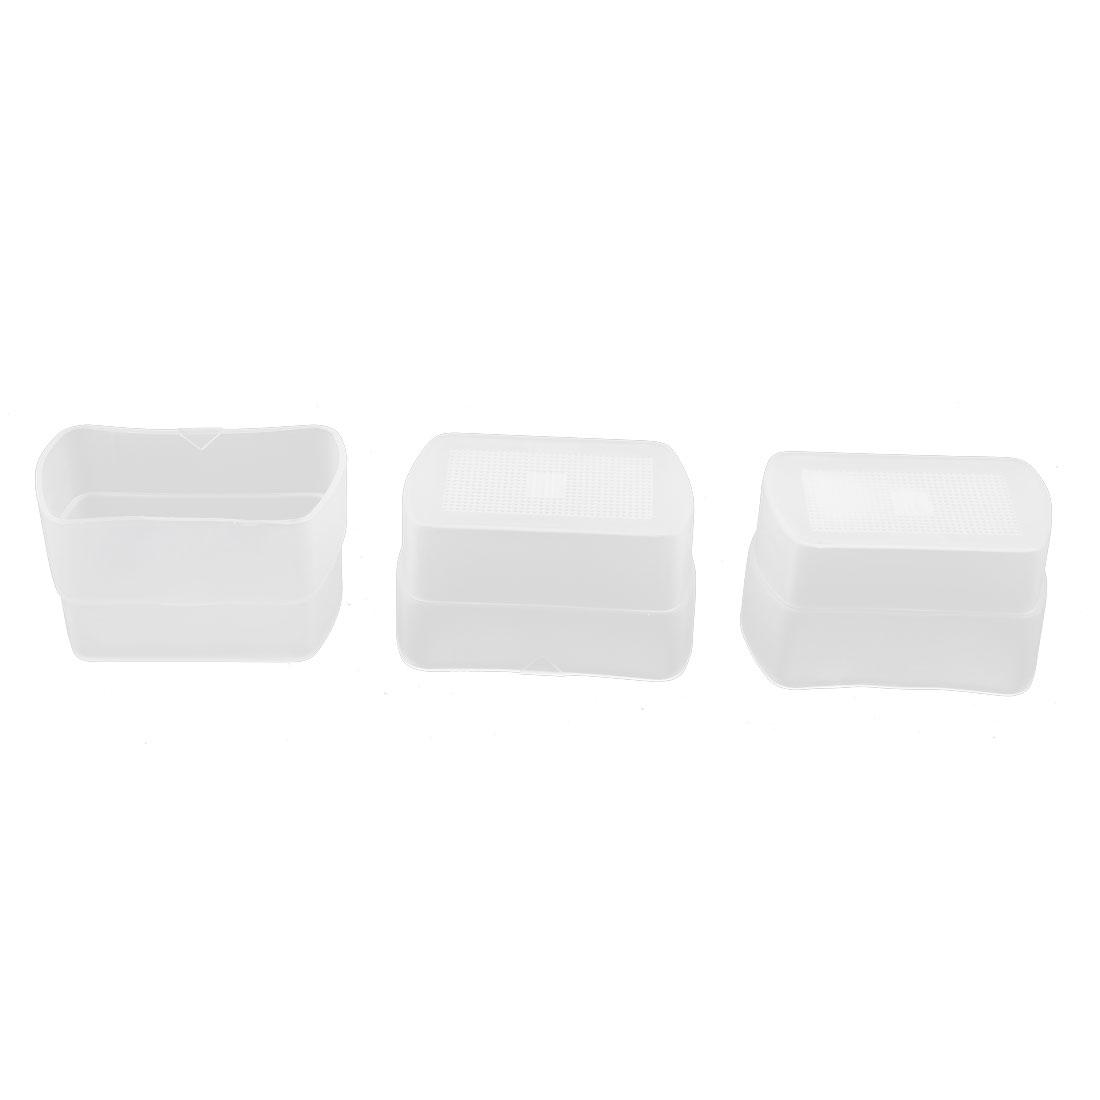 3pcs White Plastic Camera Flashlight Photoflash Flash Bounce Diffuser Cover Cap Box Softbox for Canon EX430